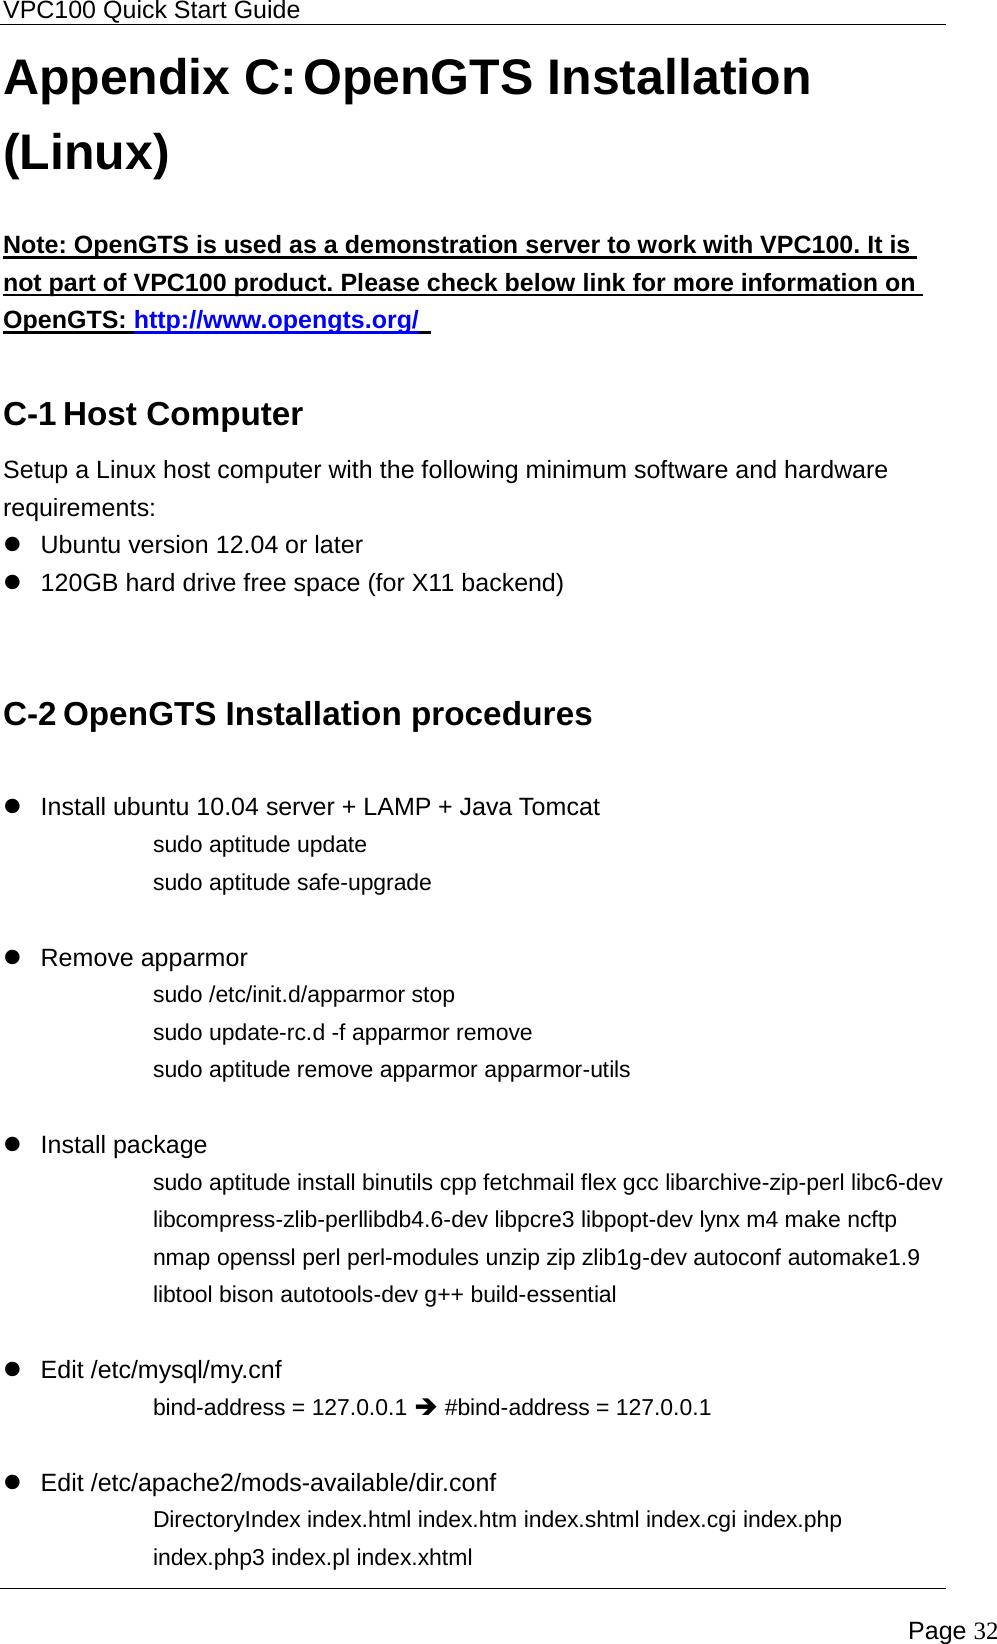 IC Nexus VPC100120SBC18 In-Vehicle Computer User Manual